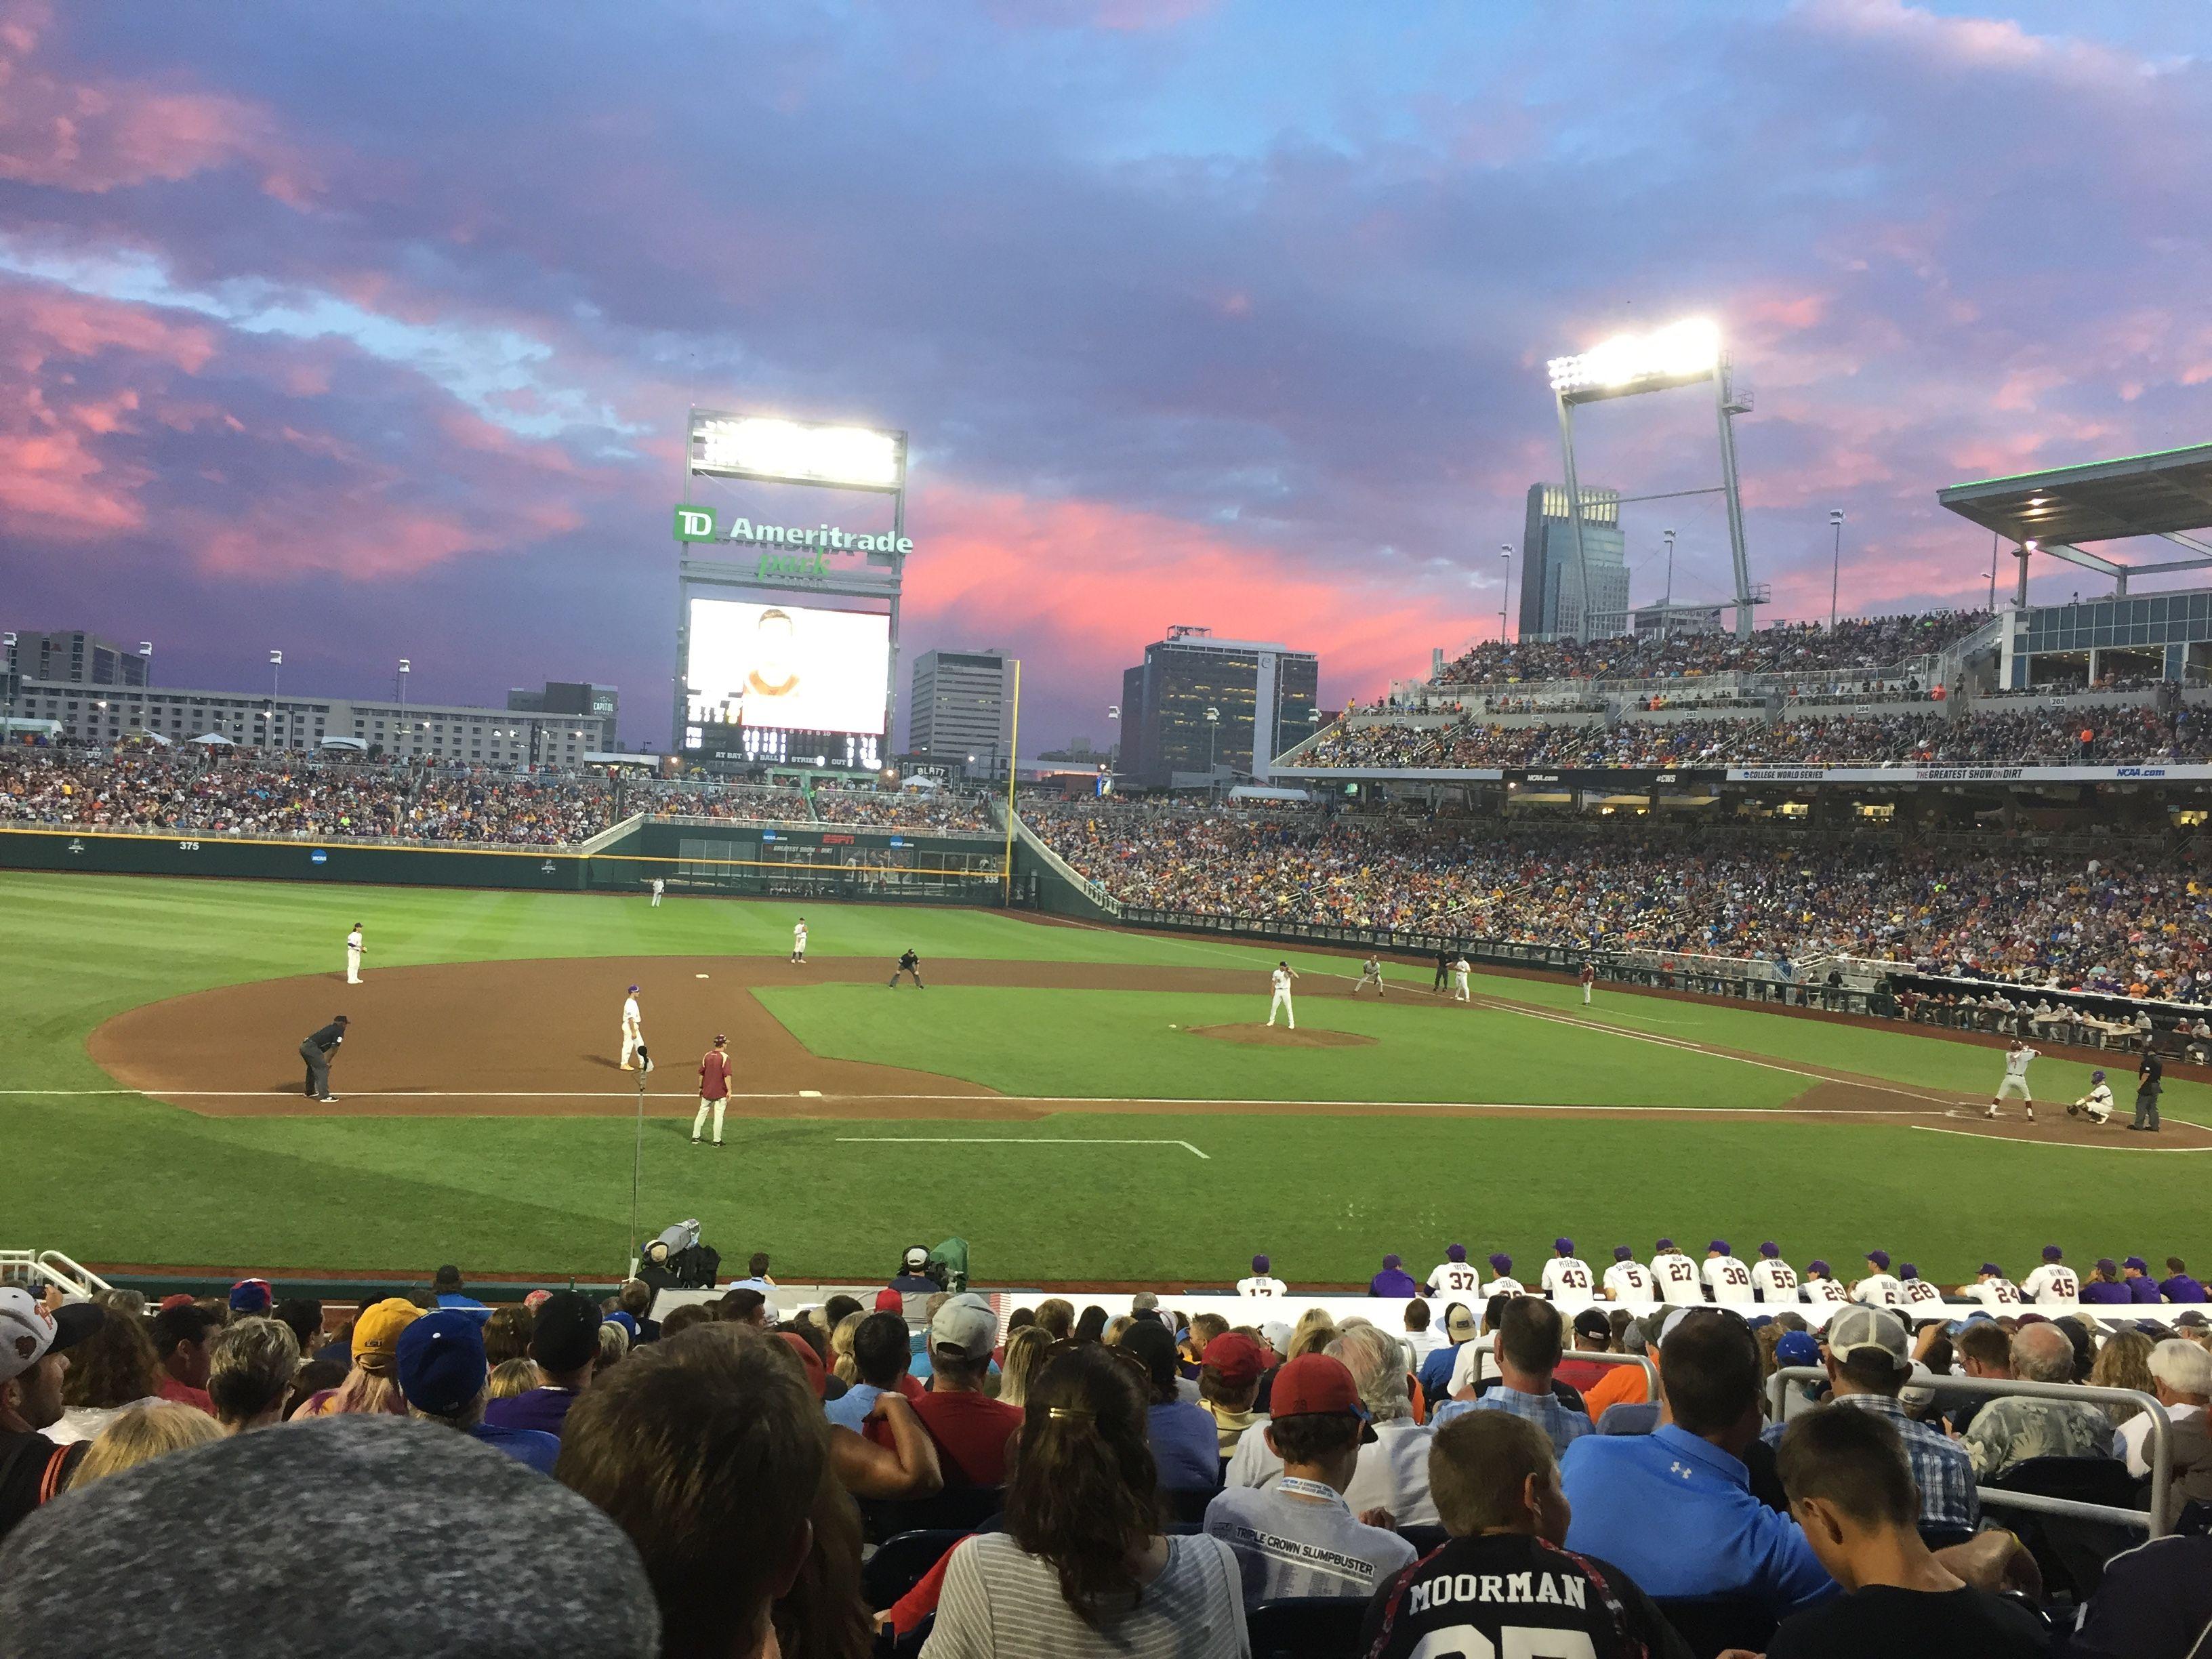 Pin On Baseball Stadiums I V Been To